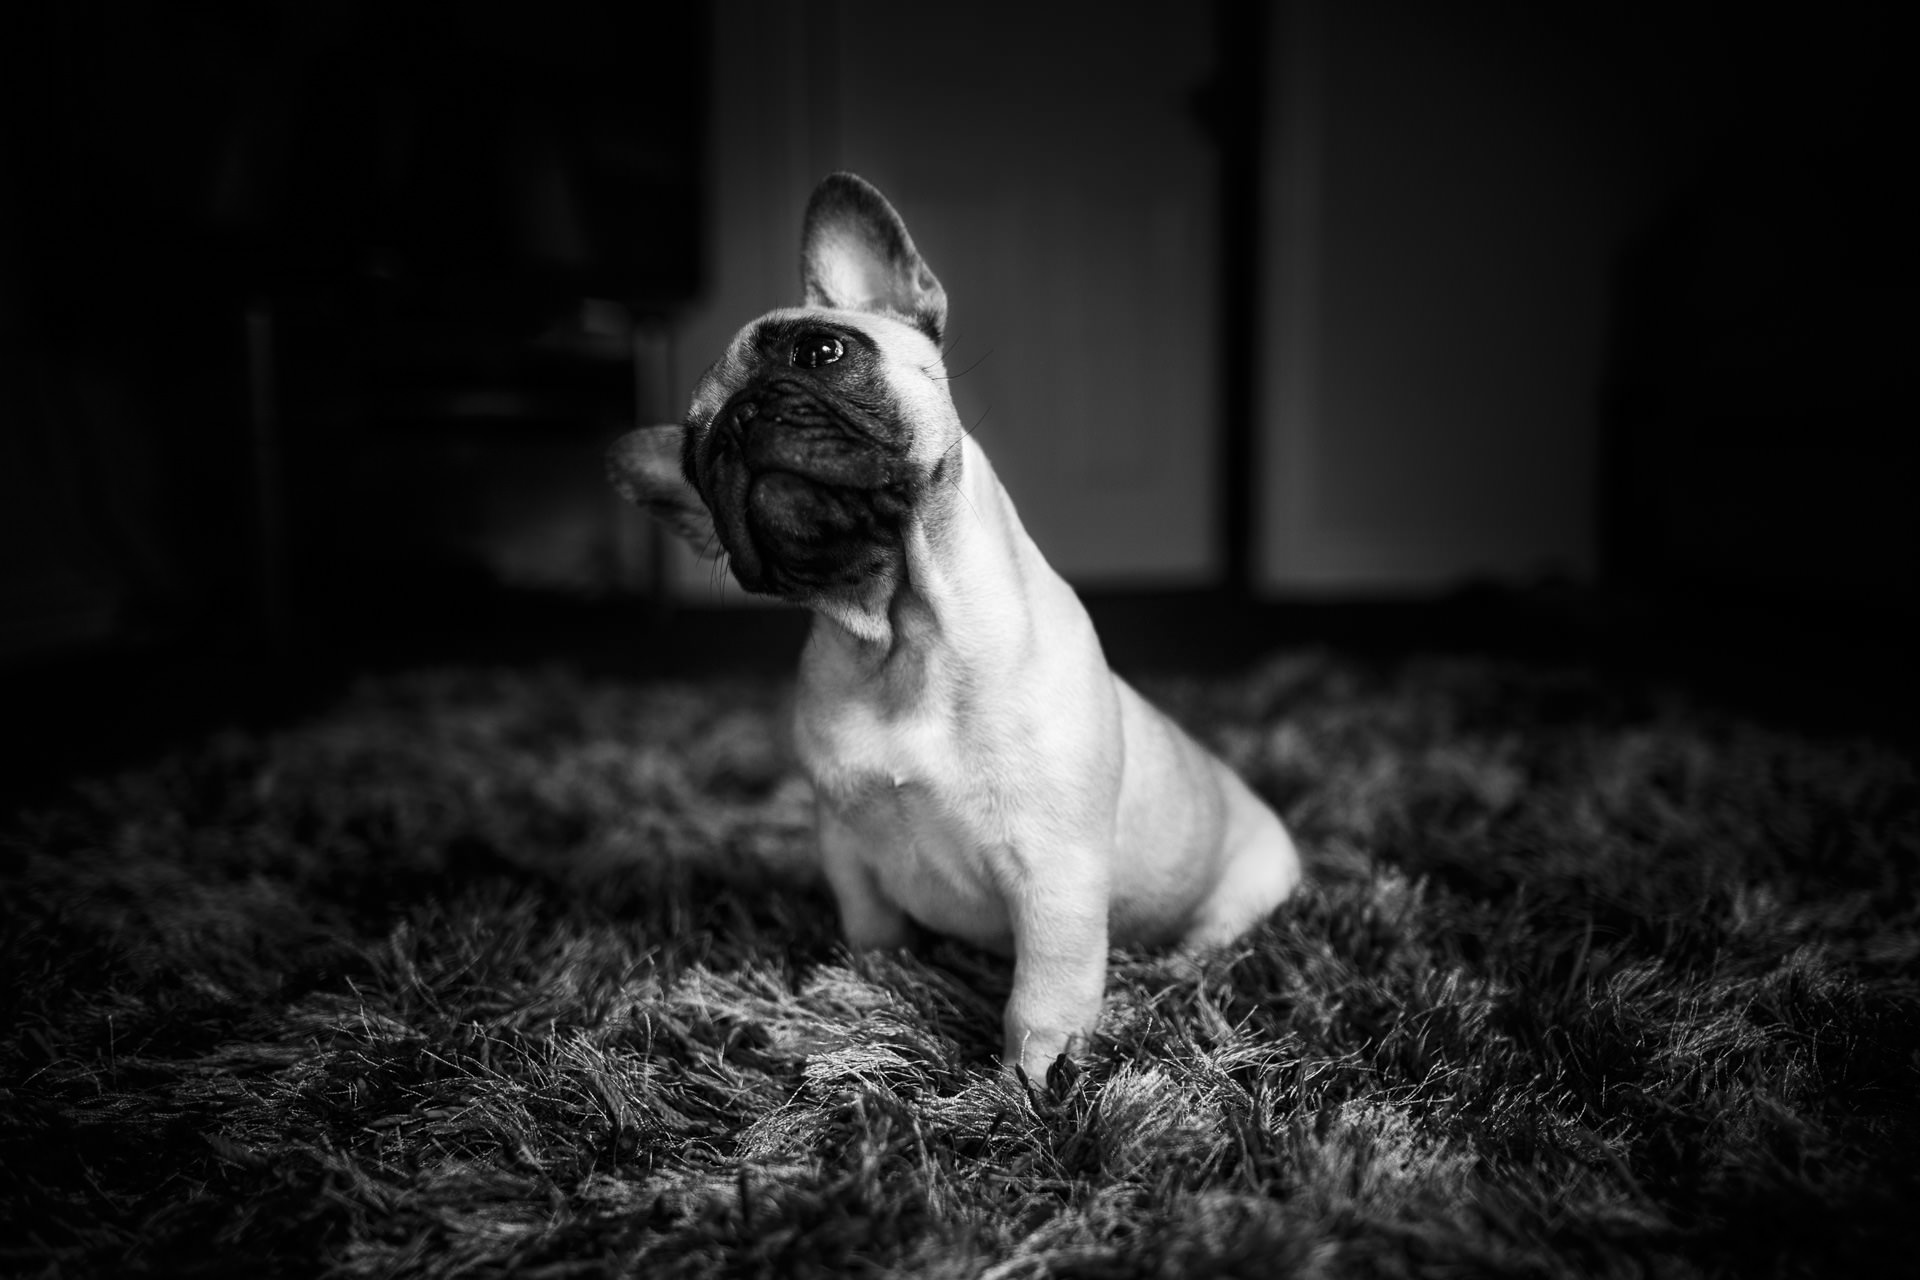 The classic head-tilt dog pose.